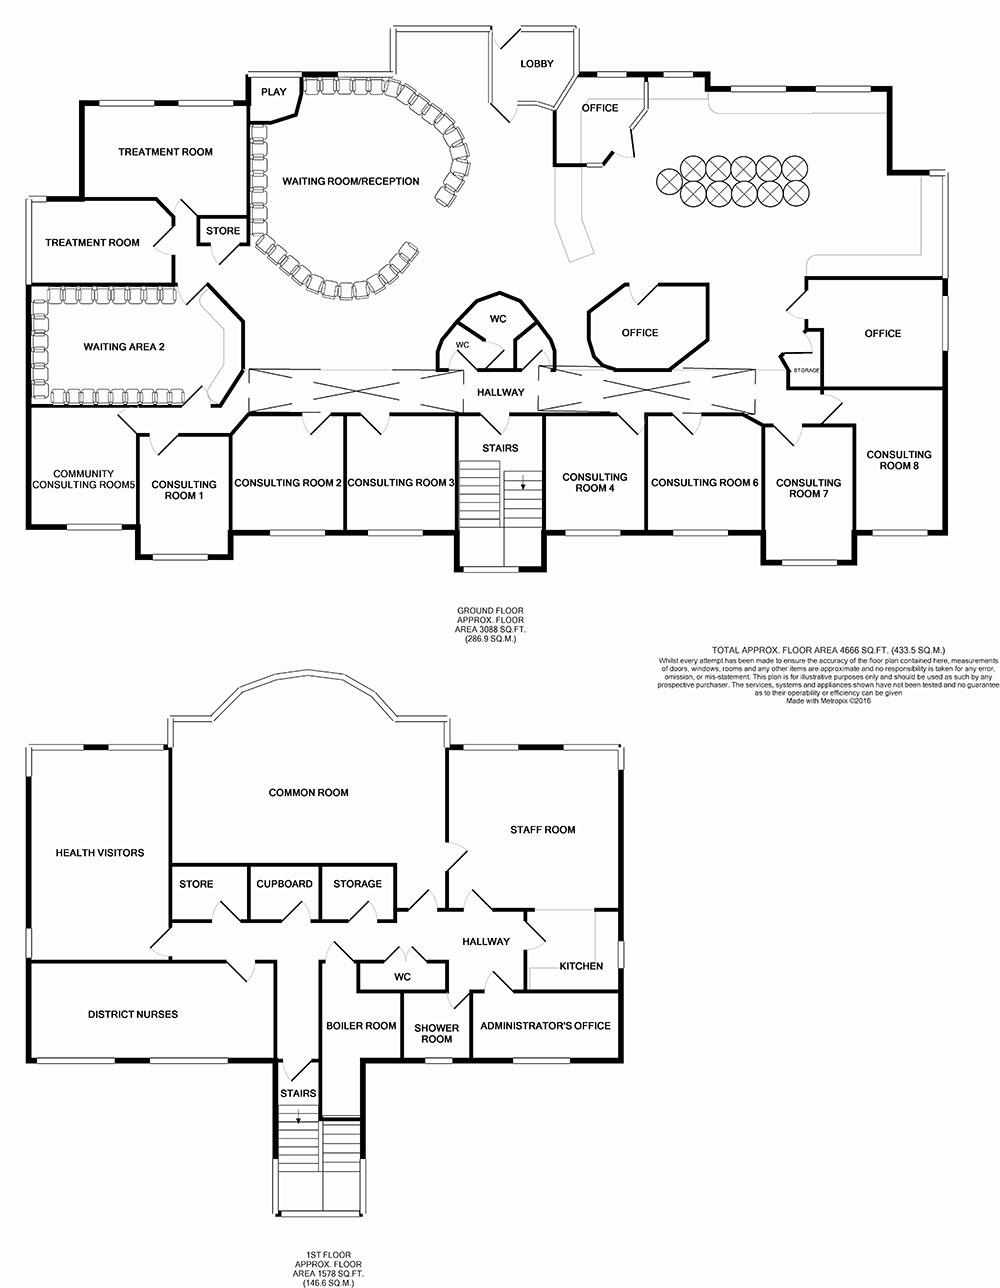 Springwell Medical Centre Floorplan - GP Surveyors